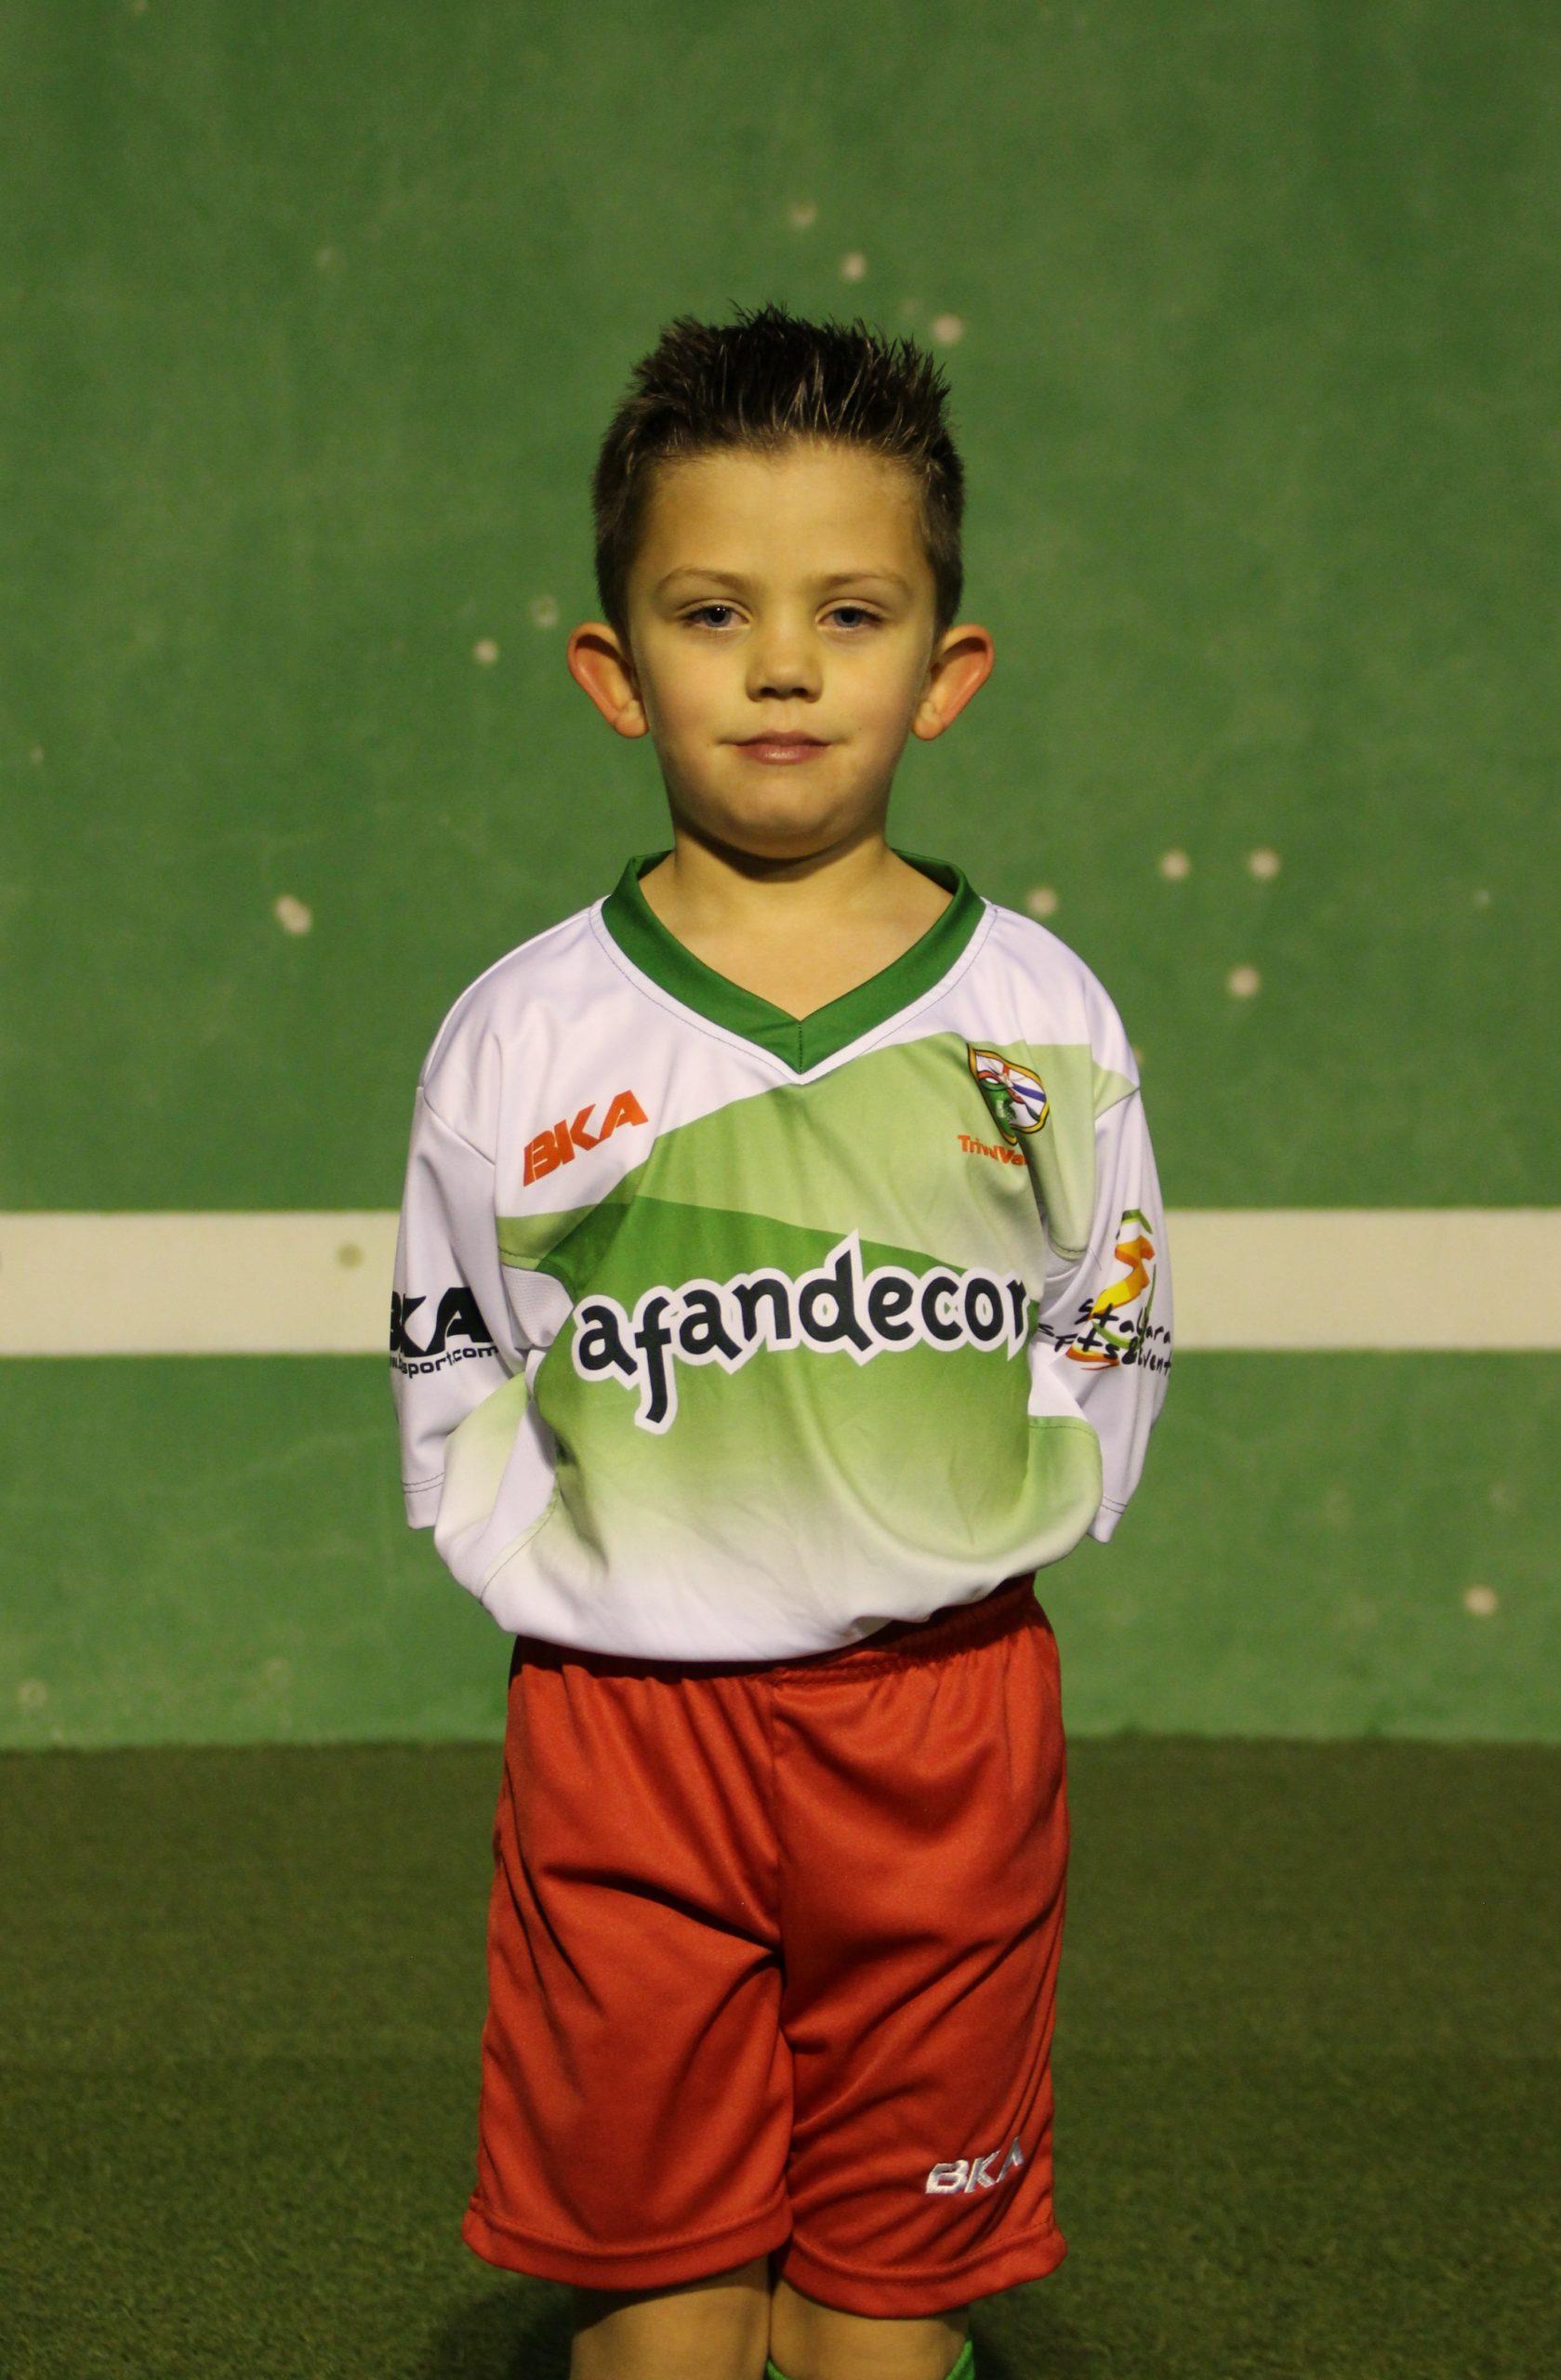 16 Vicente Colomo Estebaranz